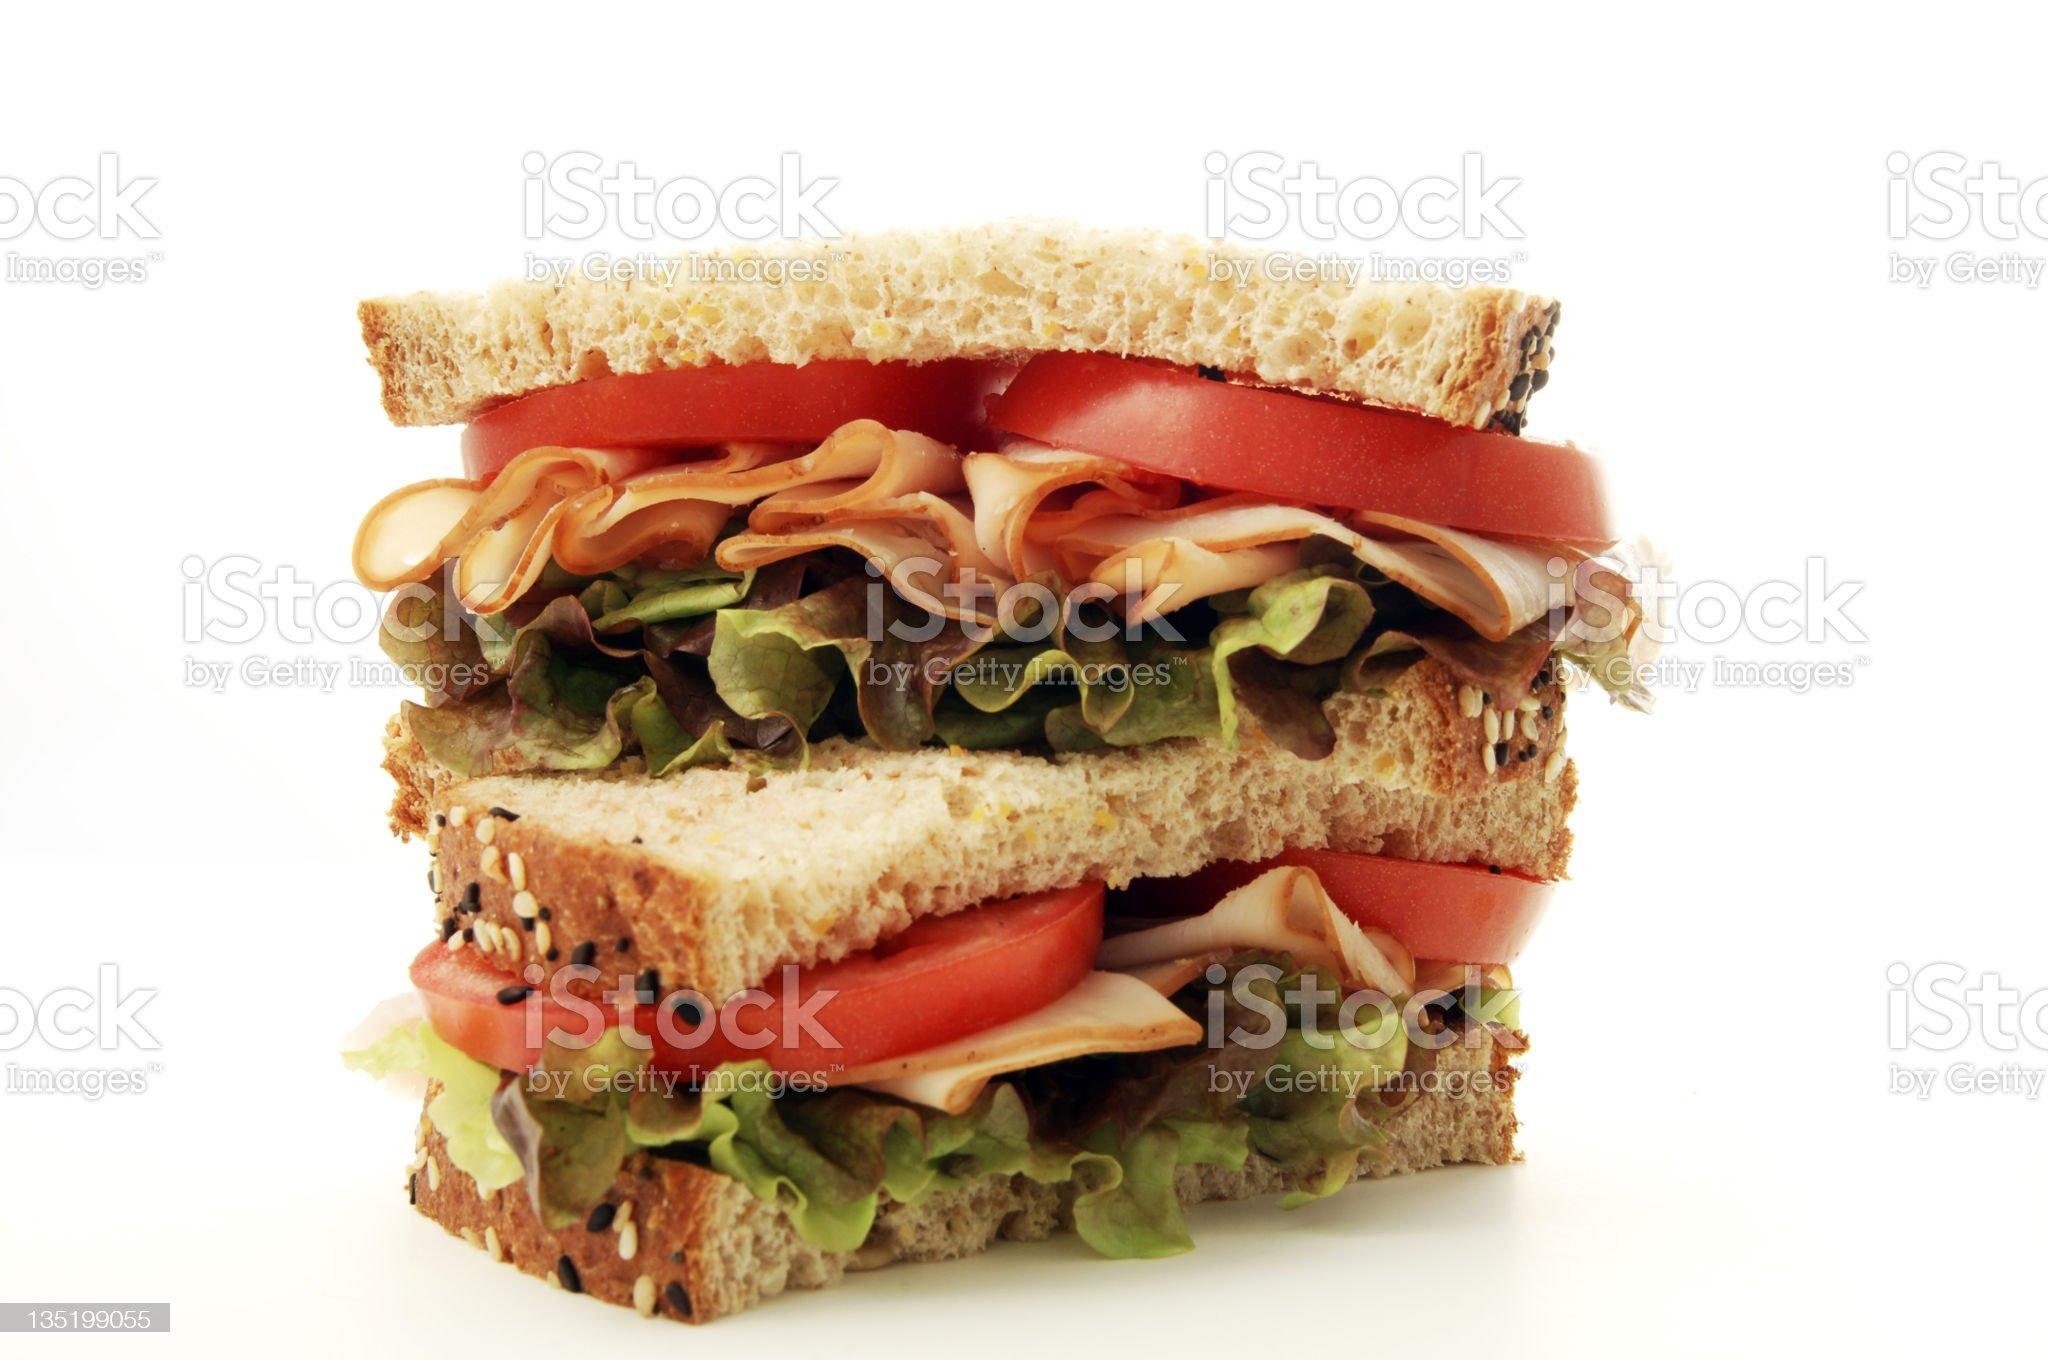 Turkey, tomato and lettuce sandwich in granary bread royalty-free stock photo